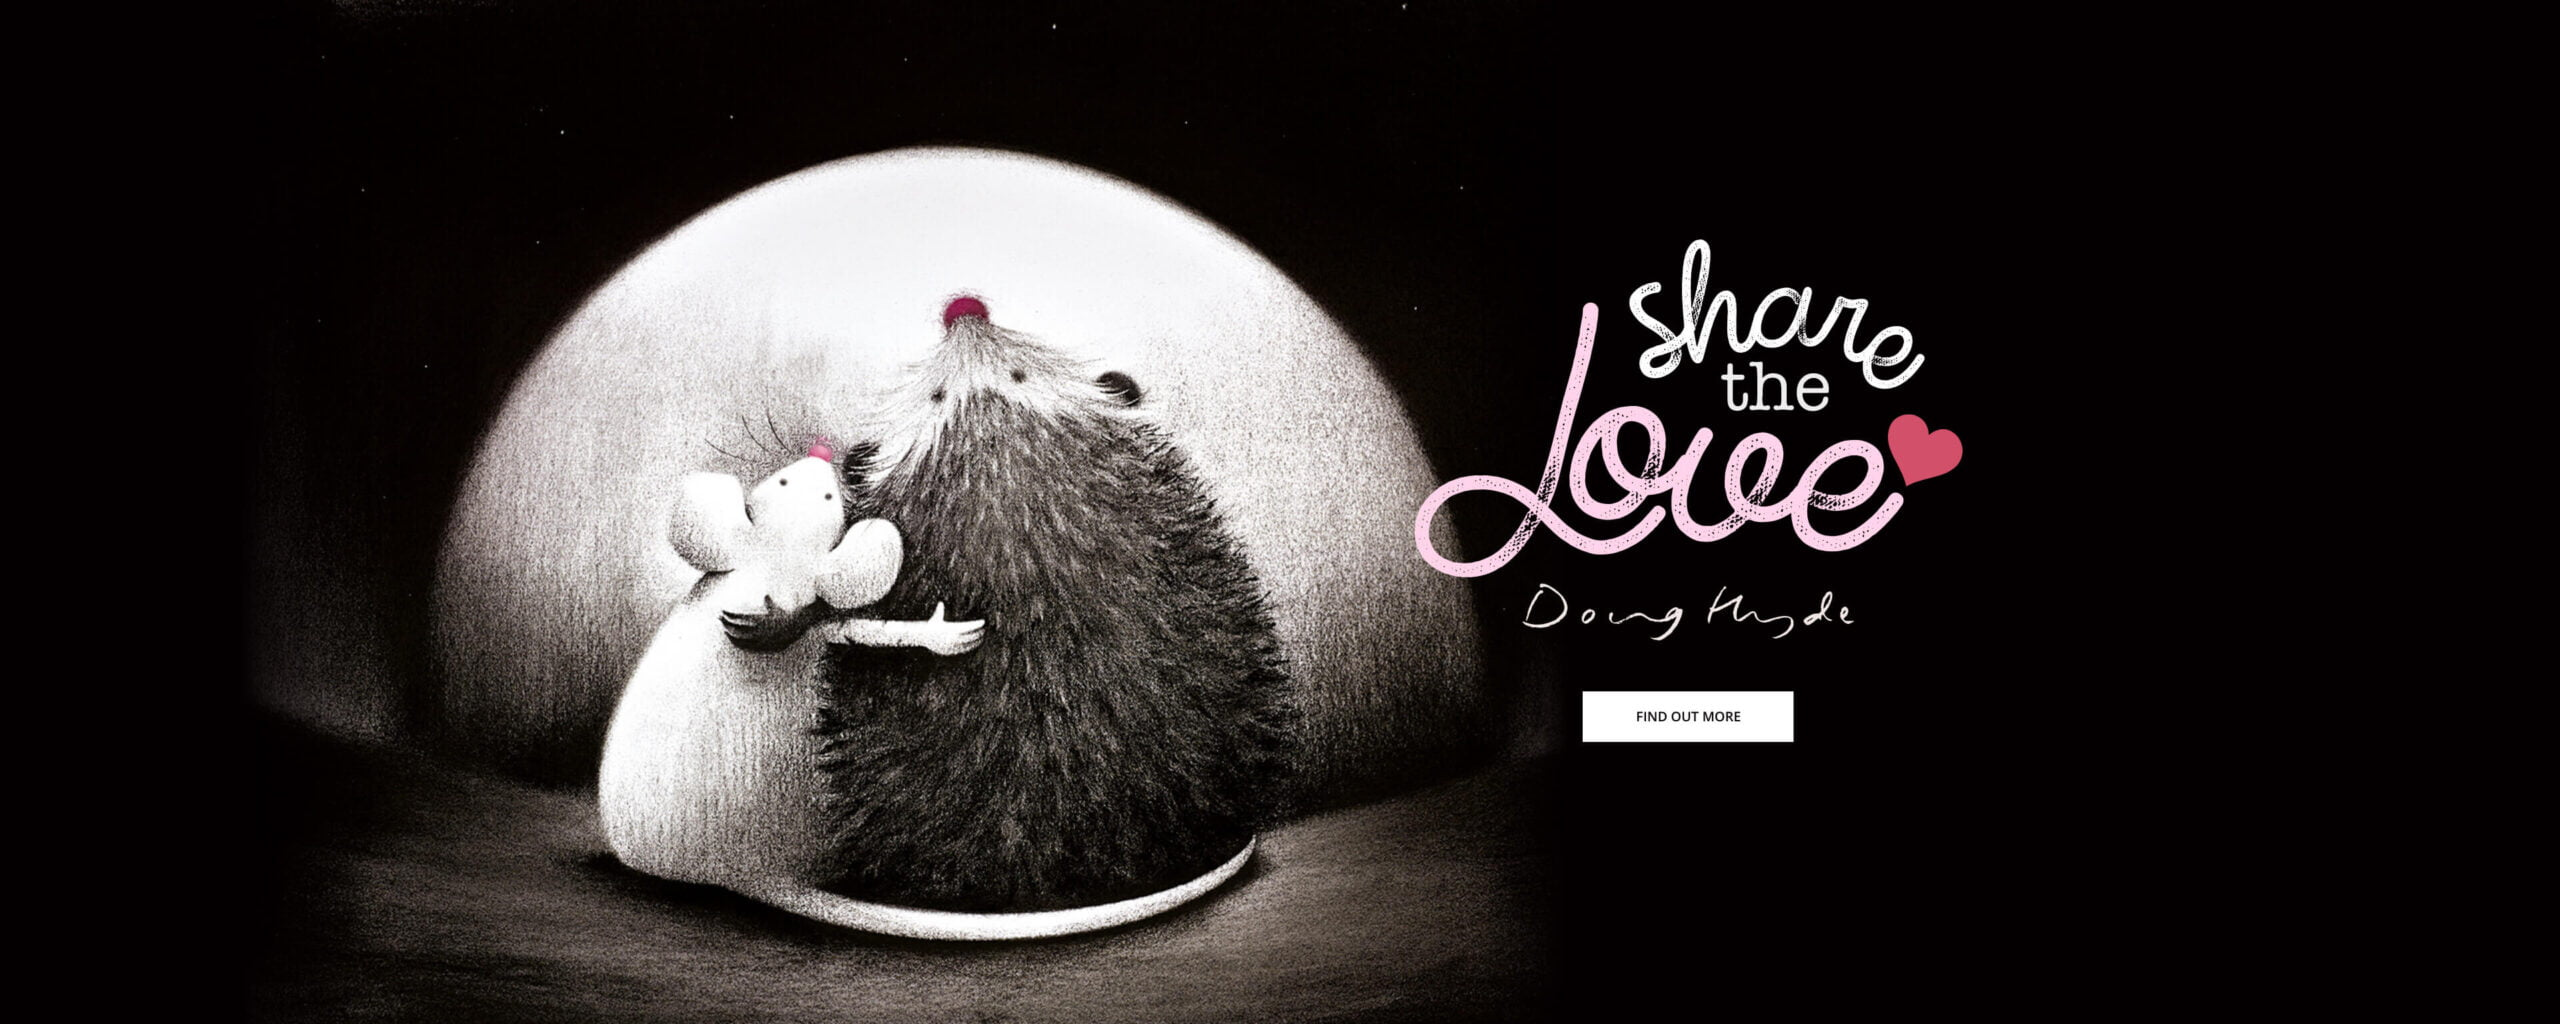 Doug Hyde – Share the Love